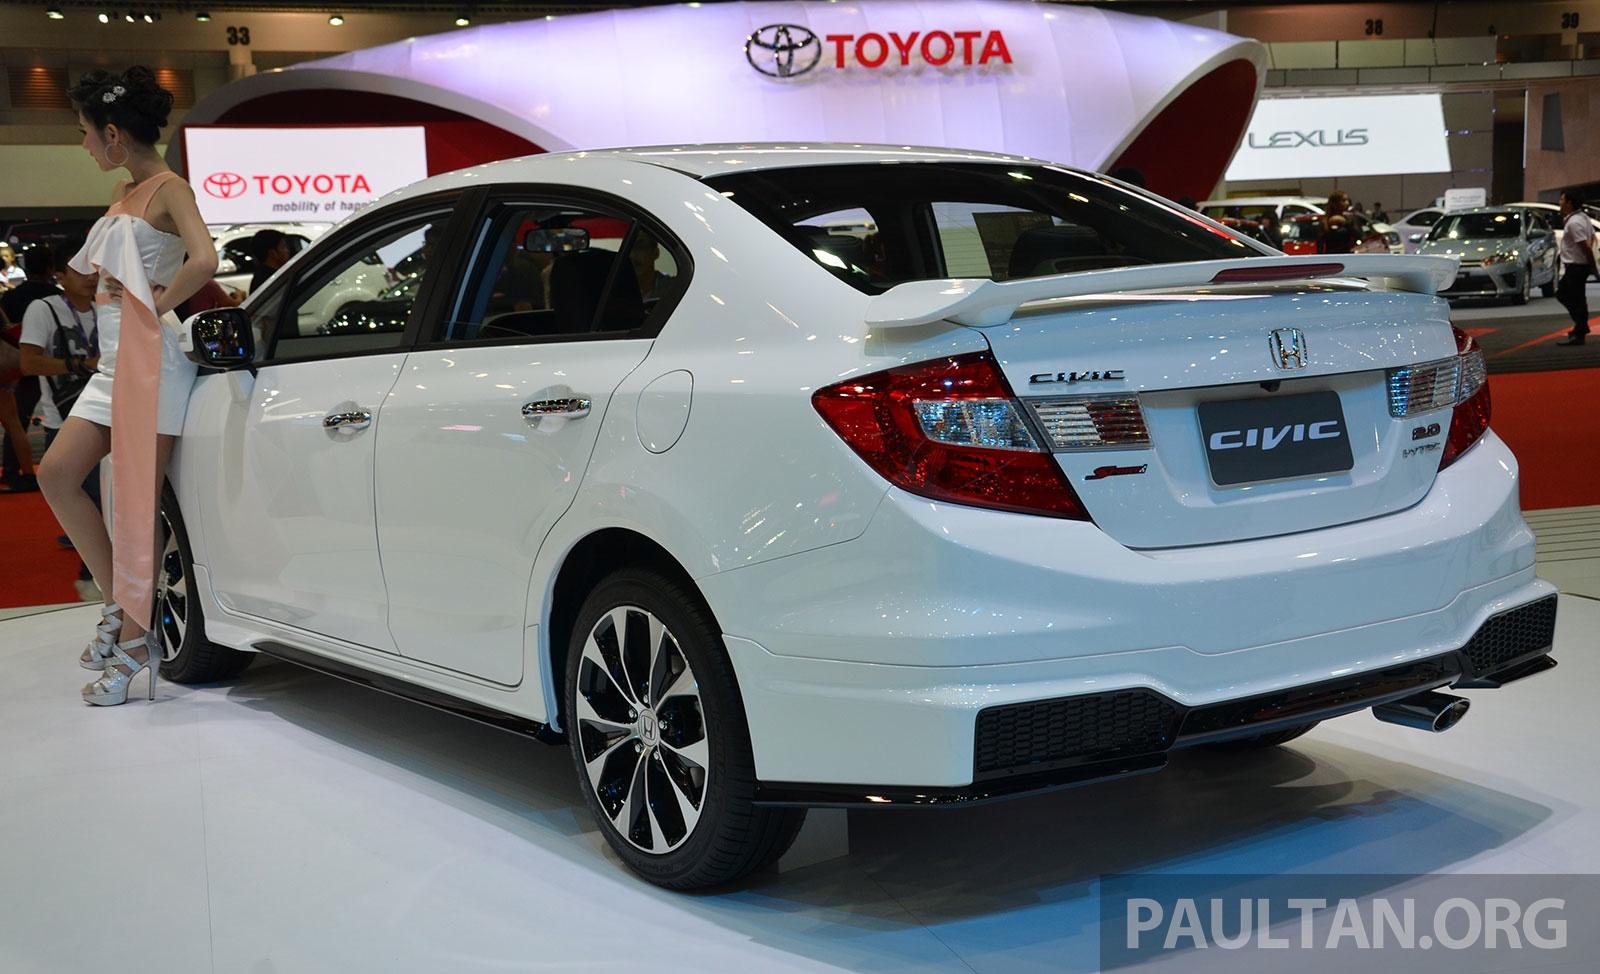 Bangkok 2014: Honda Civic MMC facelift, Thai-spec Image 237273